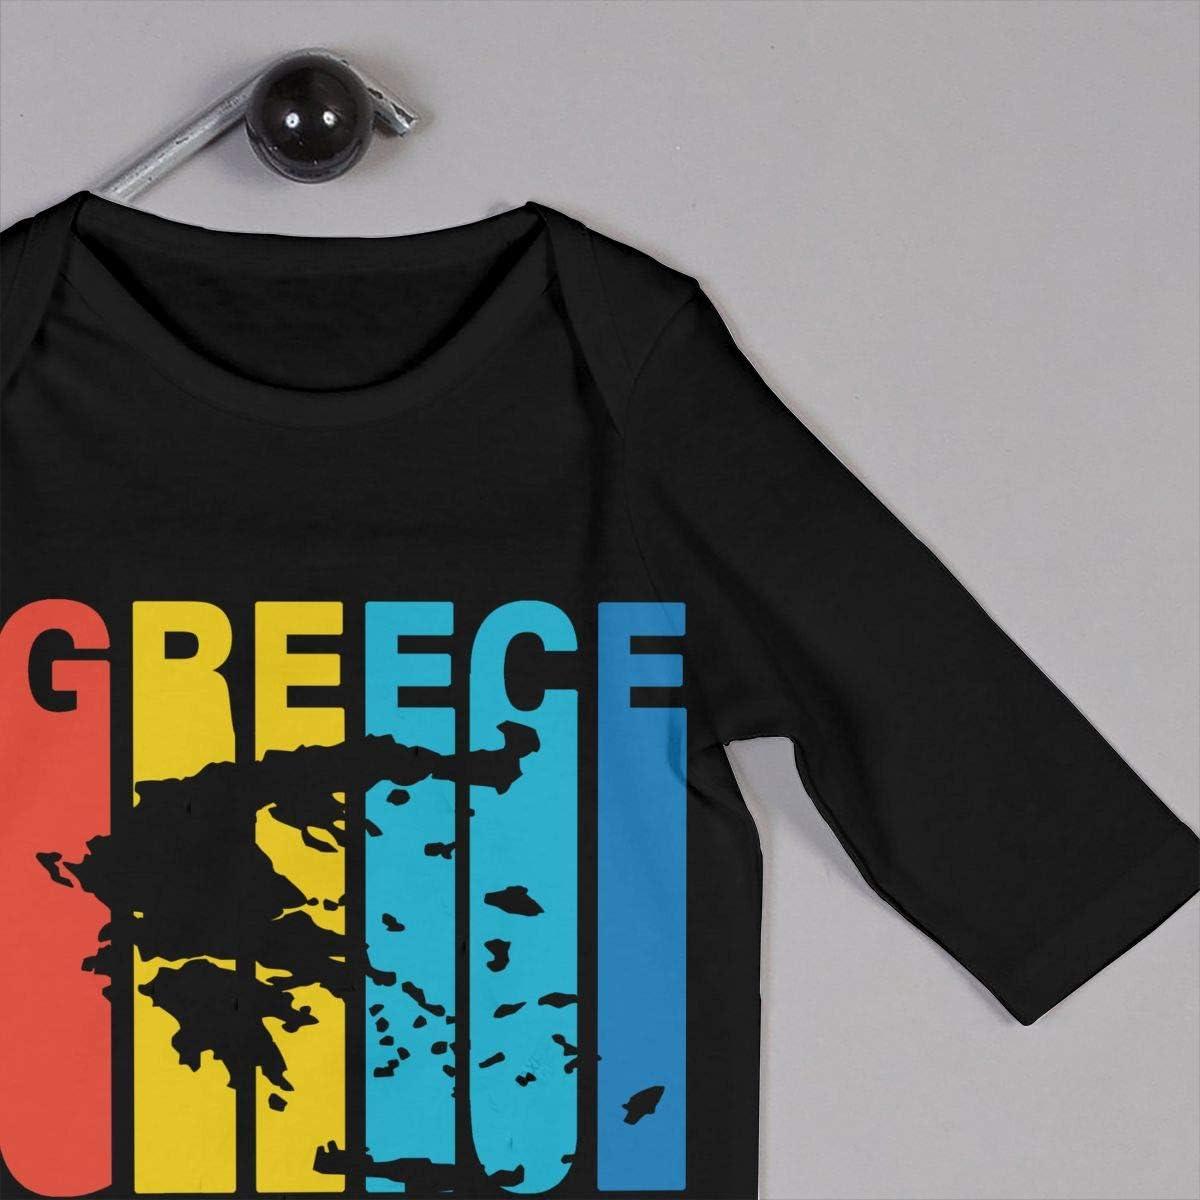 YELTY6F Greece Greek Retro 1970s Style Printed Newborn Infant Baby Boy Girl Bodysuit Long Sleeve Rompers Black